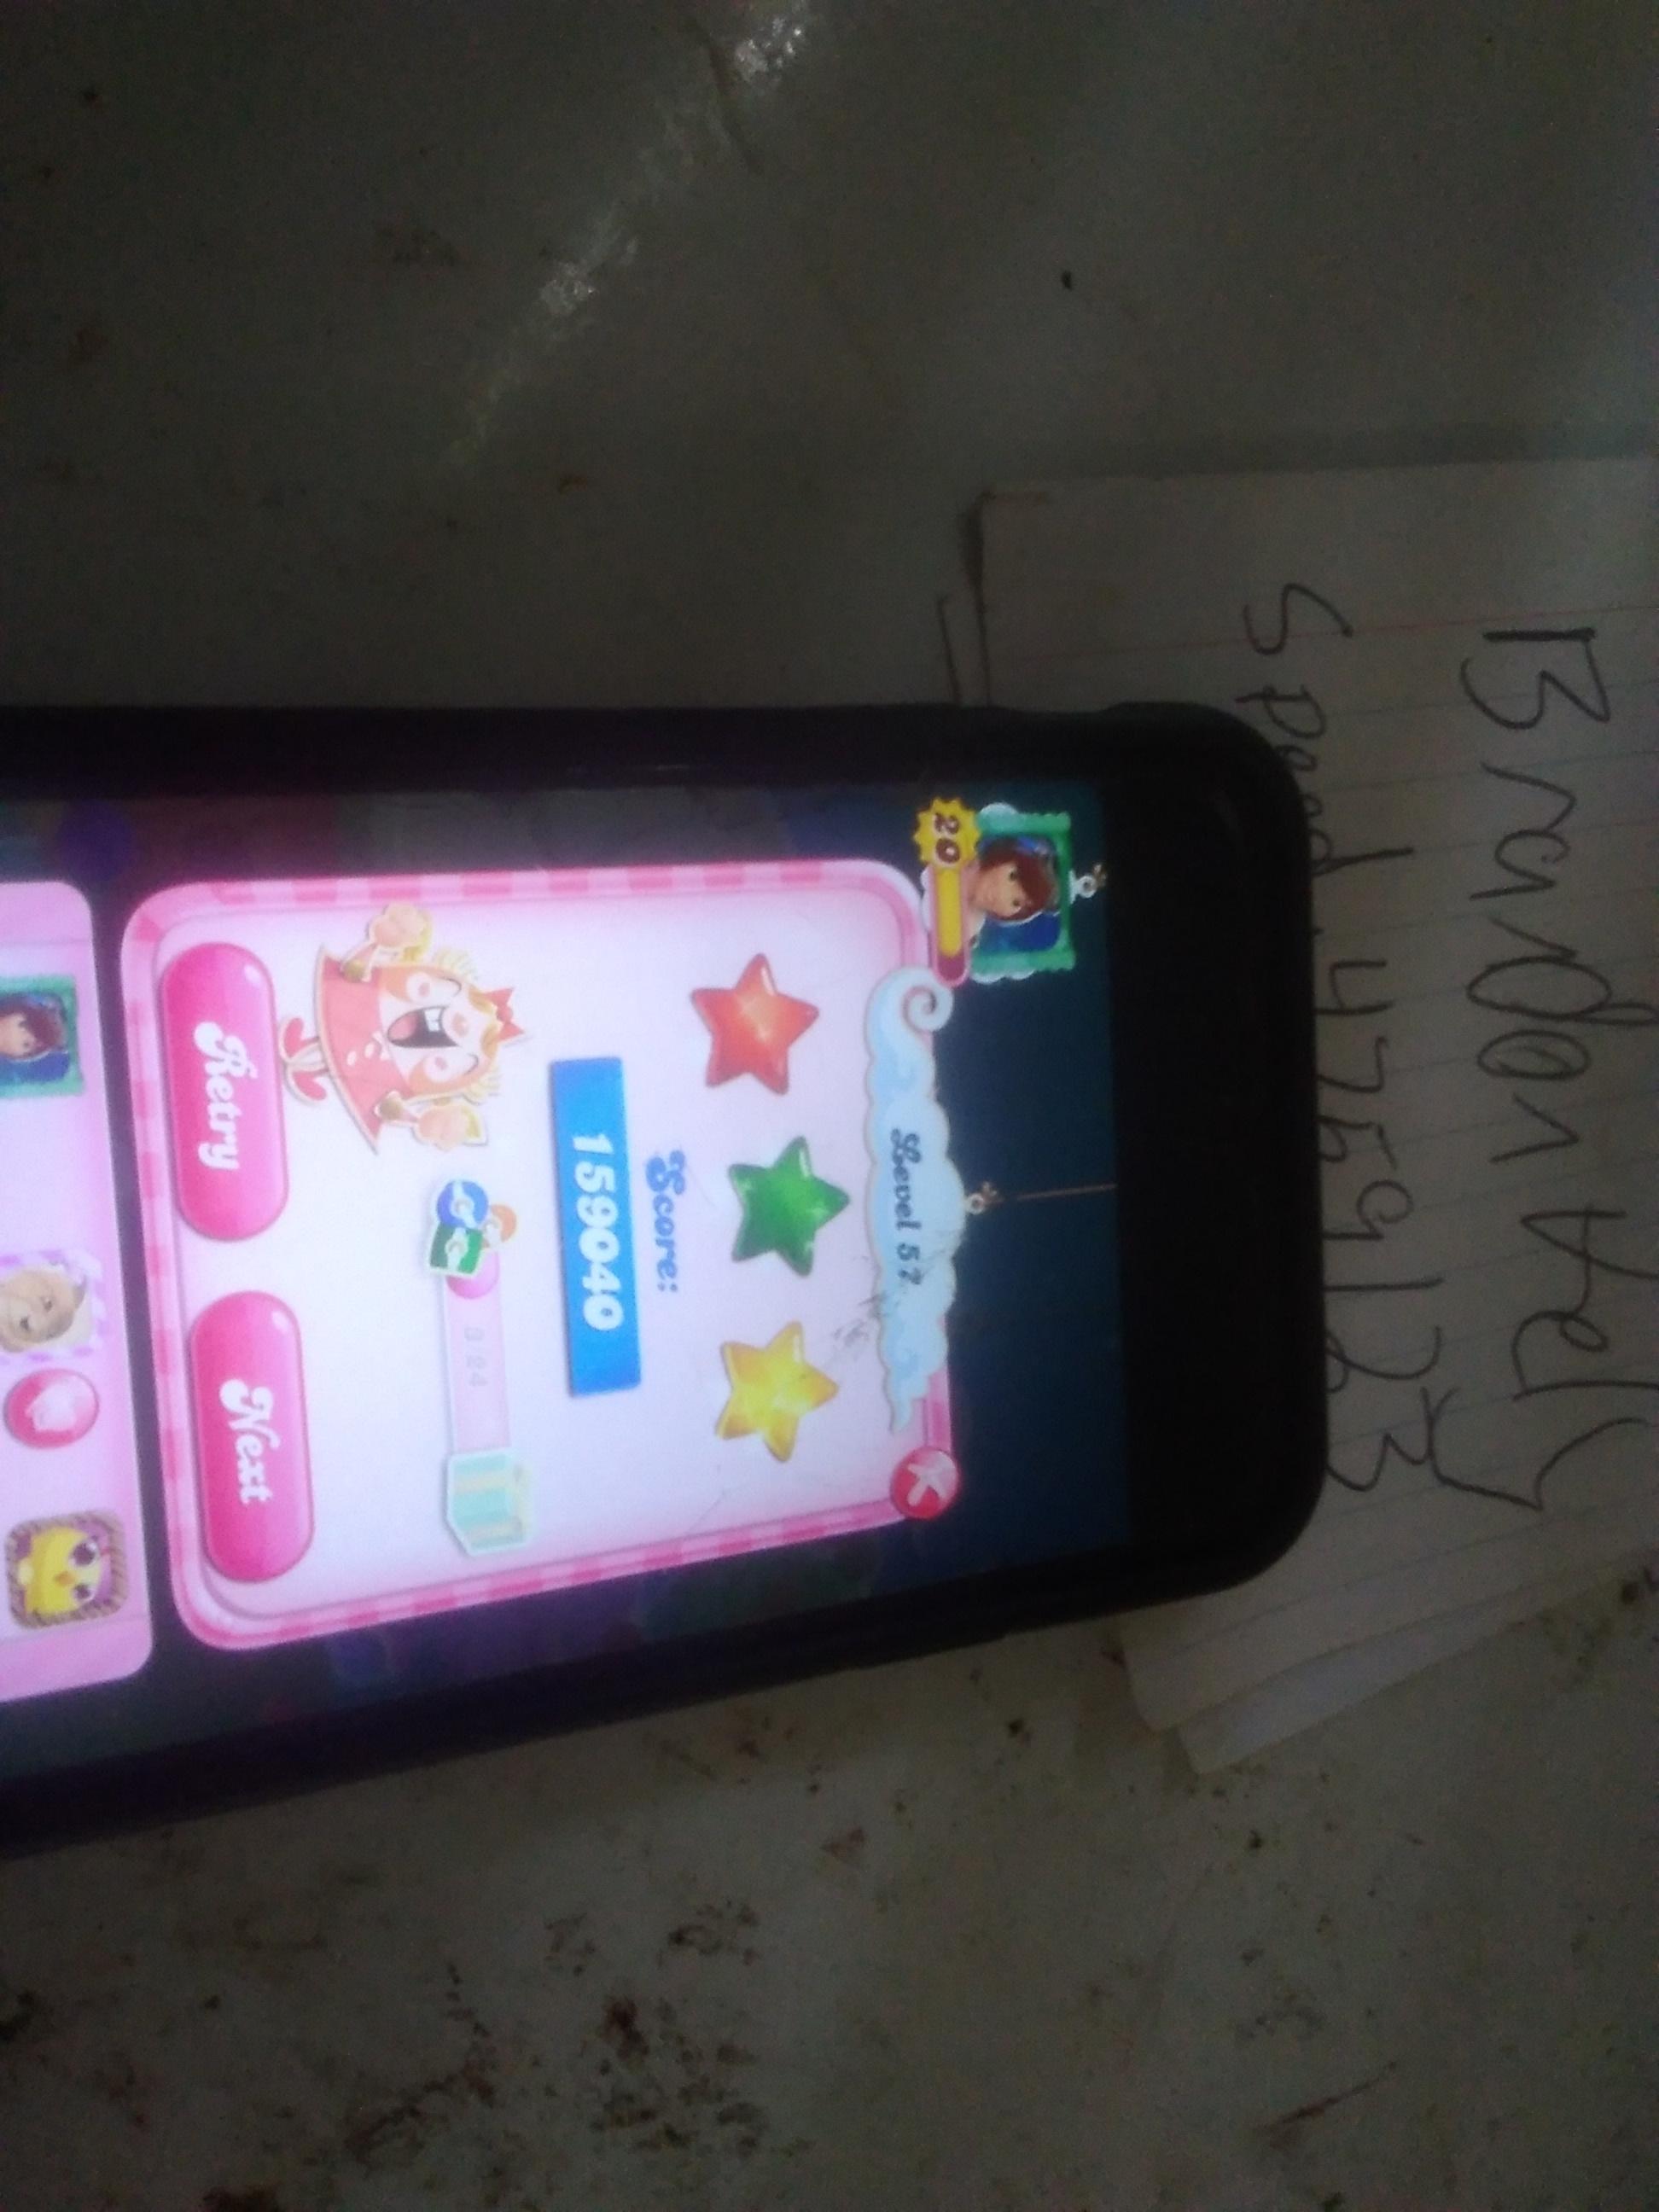 speedy4759123: Candy Crush Saga: Level 057 (iOS) 159,040 points on 2019-08-20 15:08:24